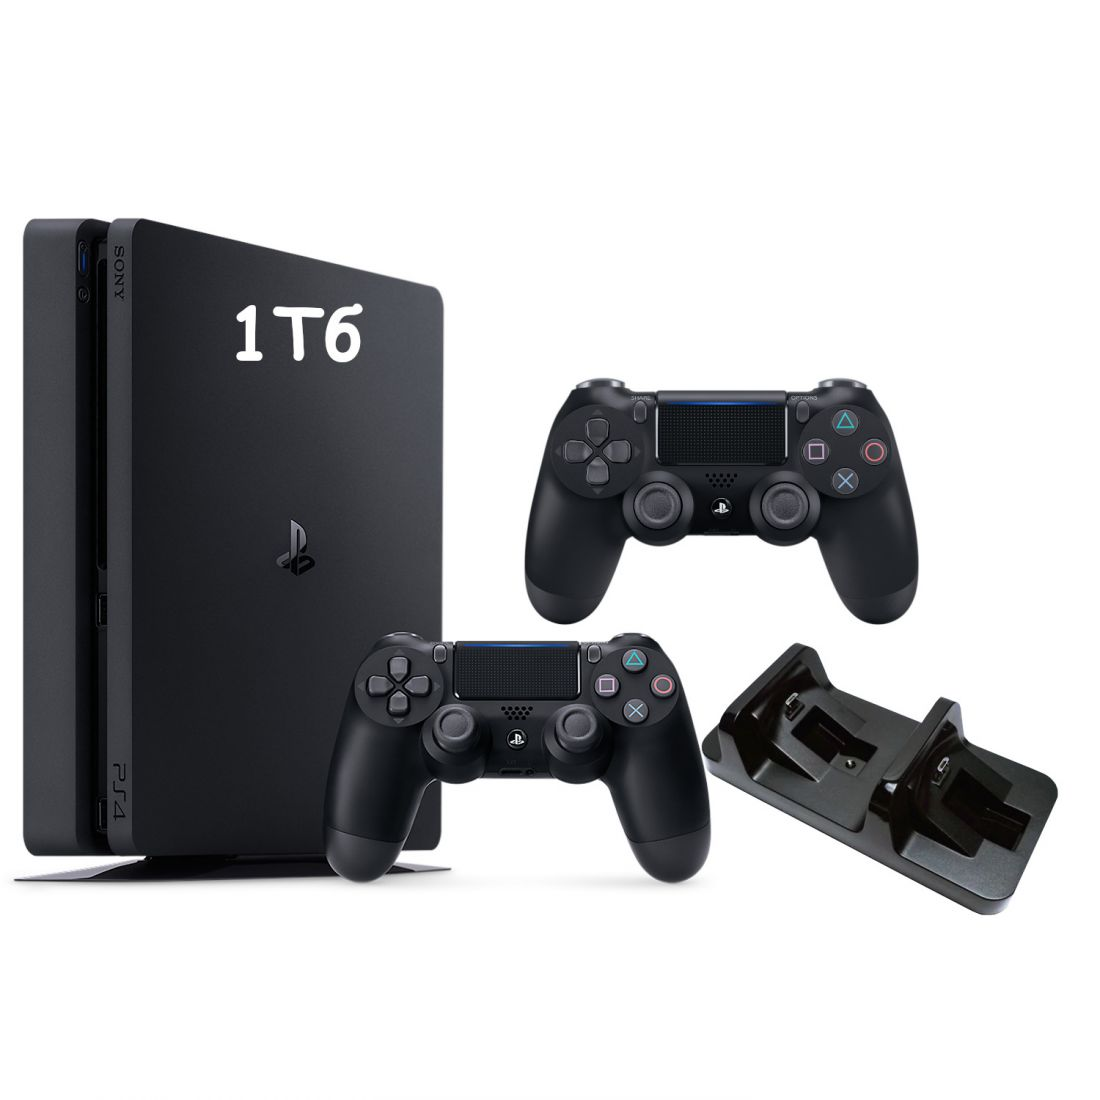 Sony PlayStation 4 Slim 1 Тб + Доп. джойстик + Зарядка для 2х джойстиков + Вертикальная подставка